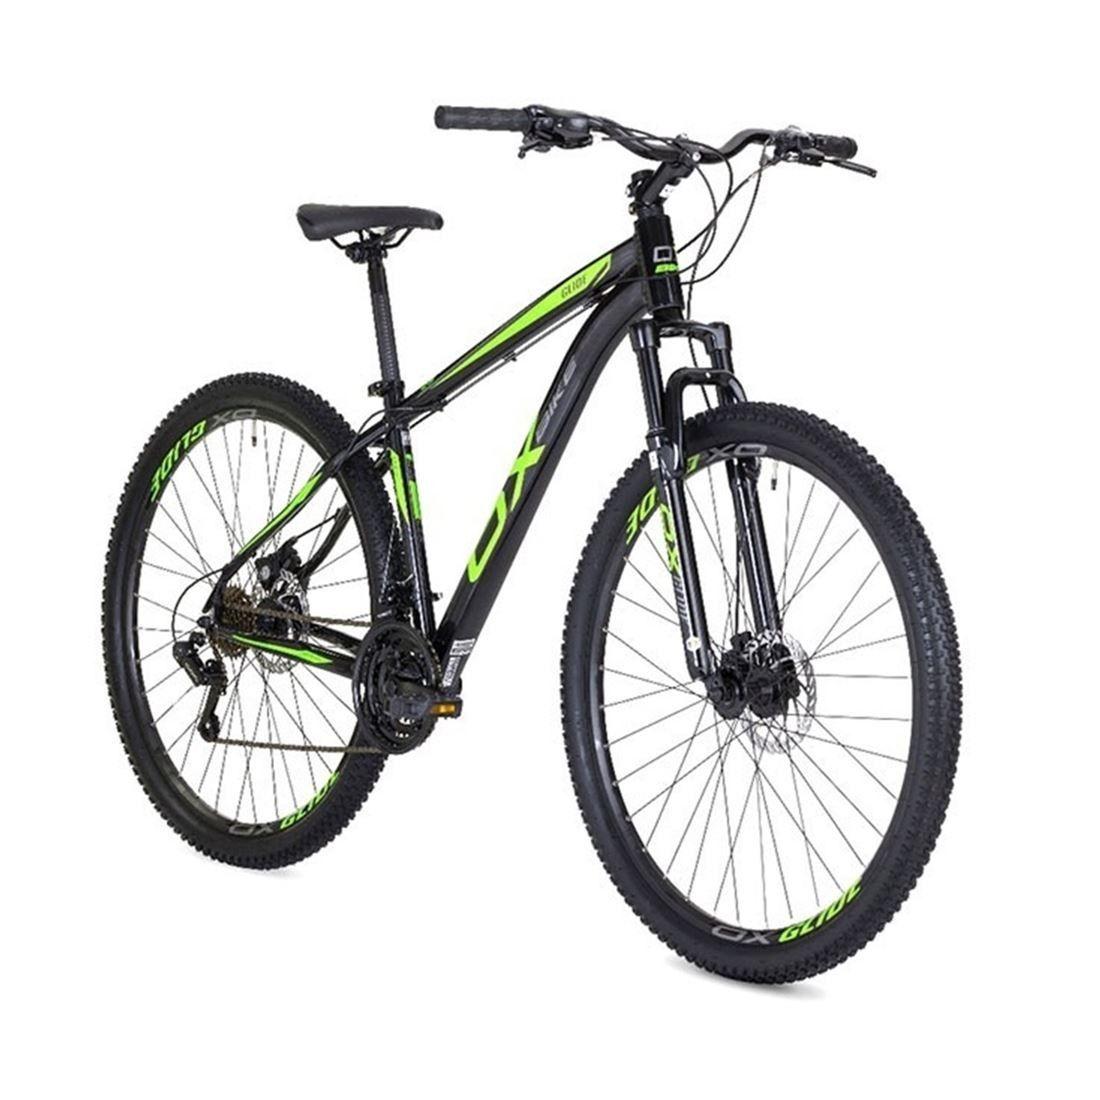 "Bicicleta MTB alumínio Ox Glide 29"" 2018"